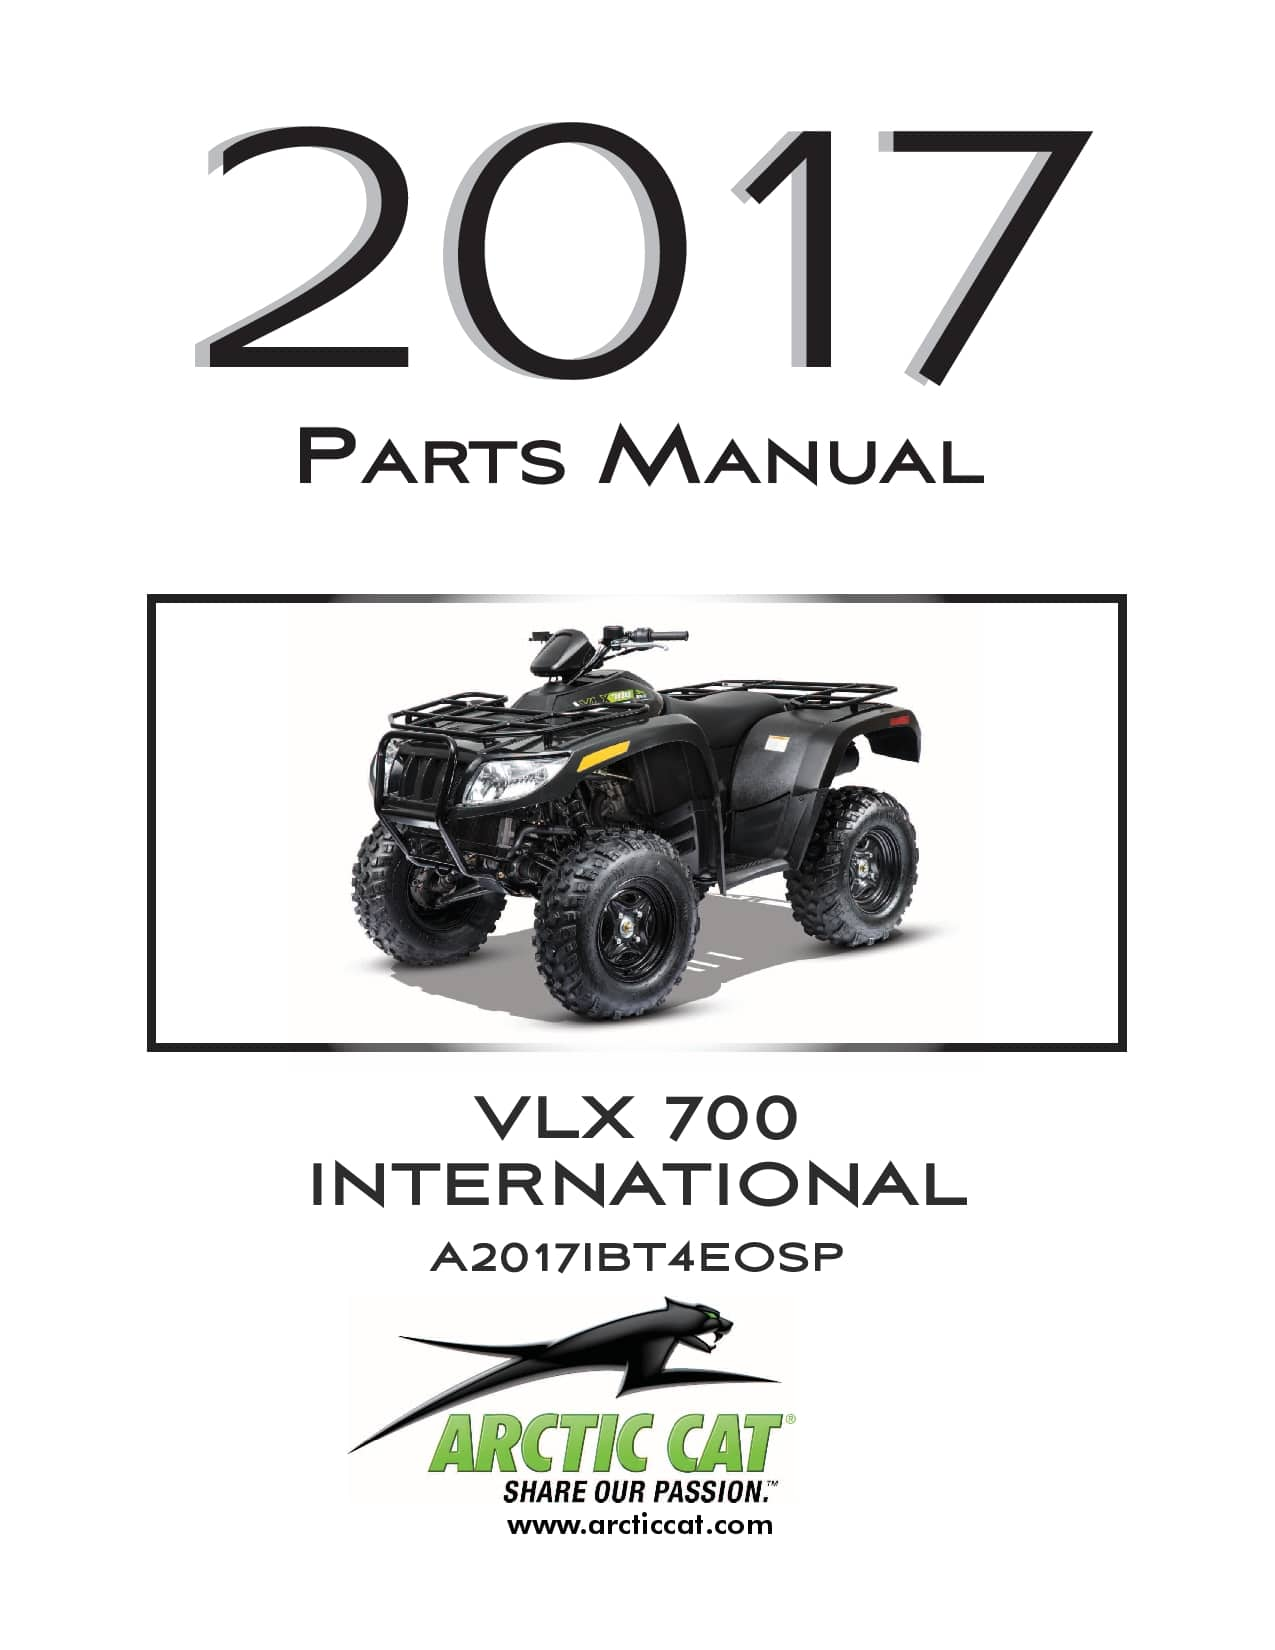 ARCTIC CAT 2017 VLX 700 Black International part manual